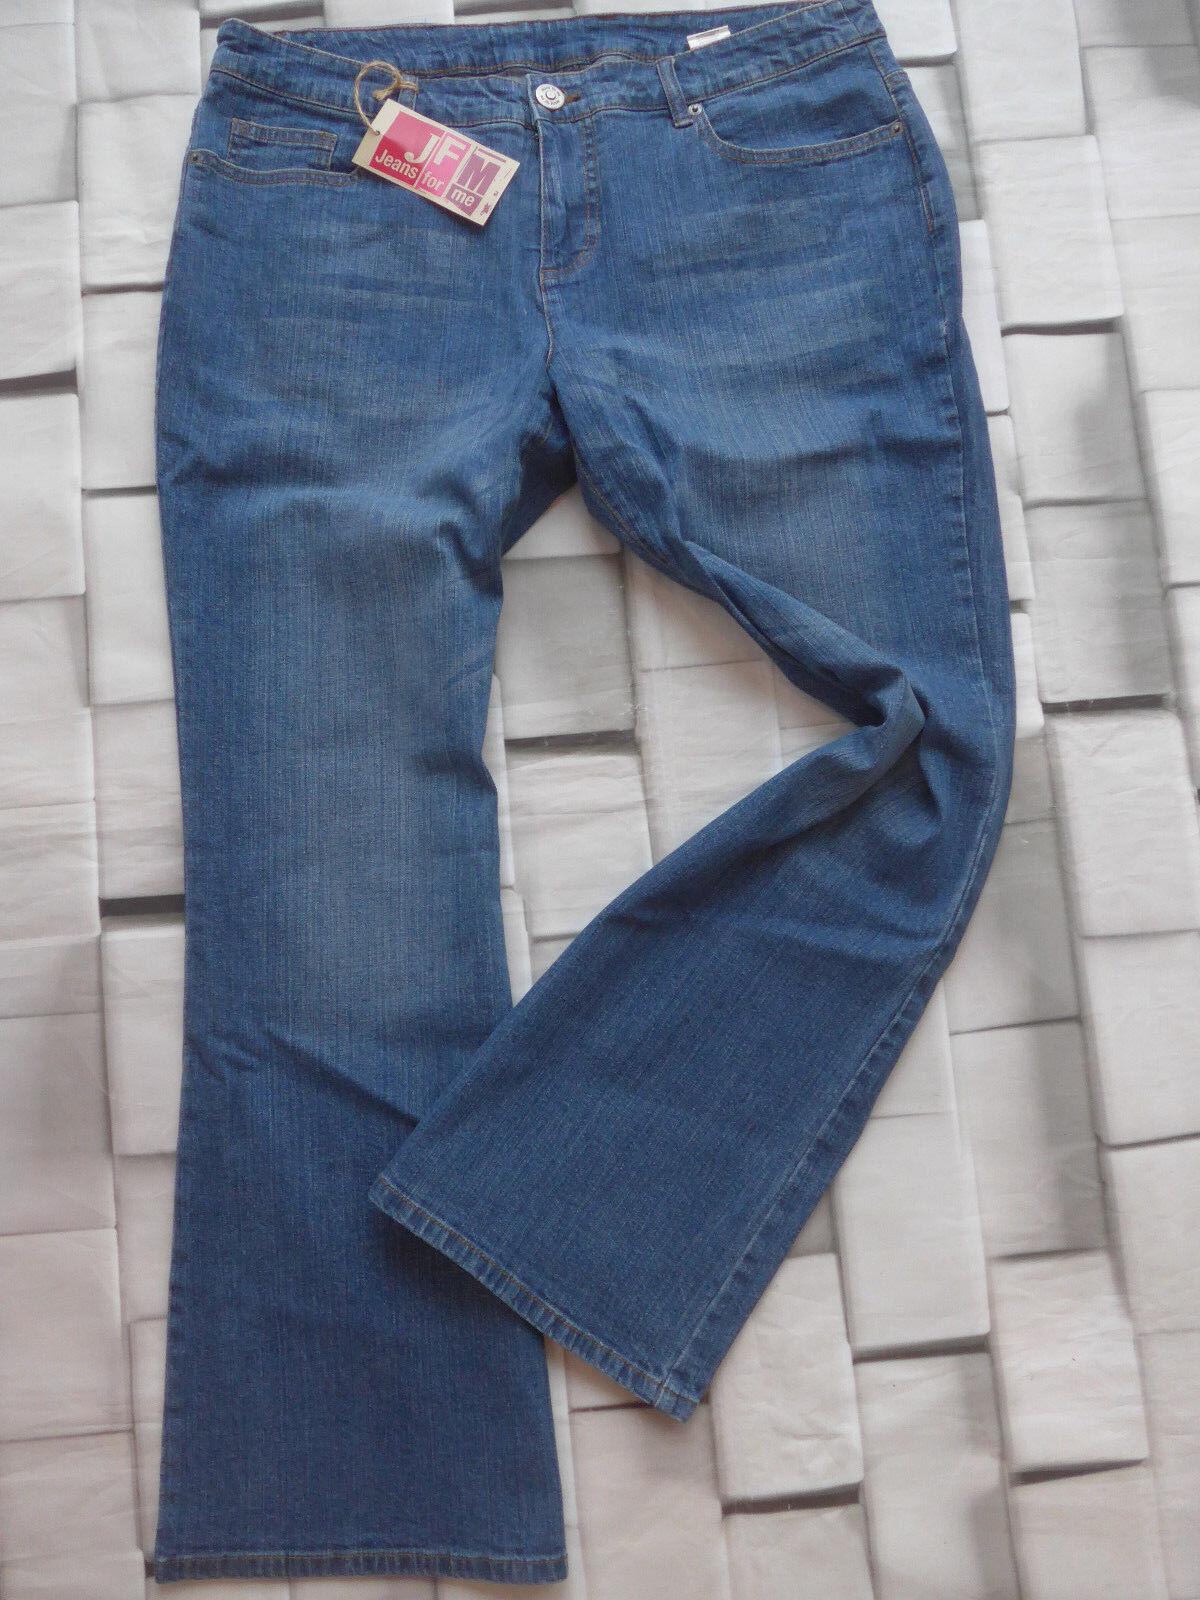 Jfm Pants Jeans Pants Size 44 Long and short Size bluee (849) New